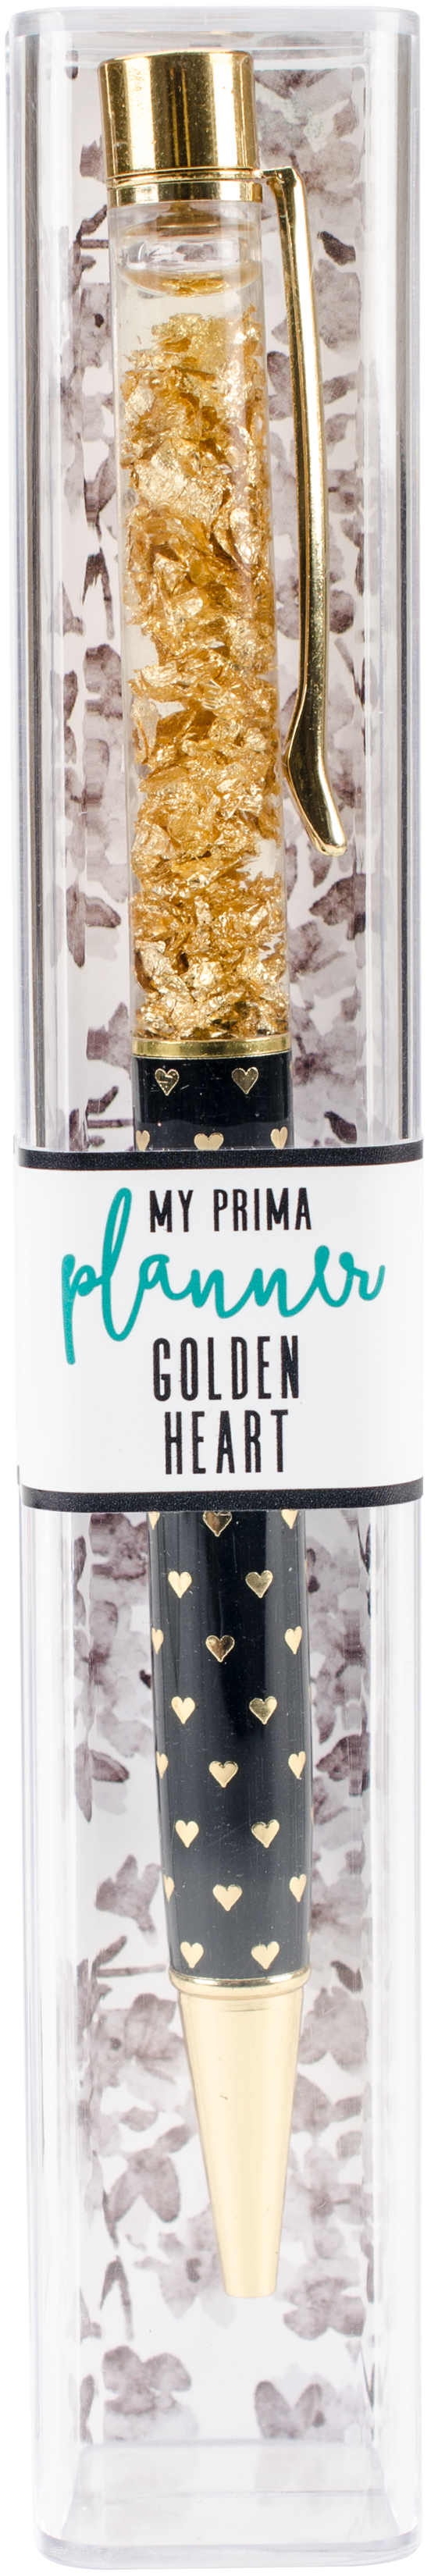 Prima Planner Golden Heart